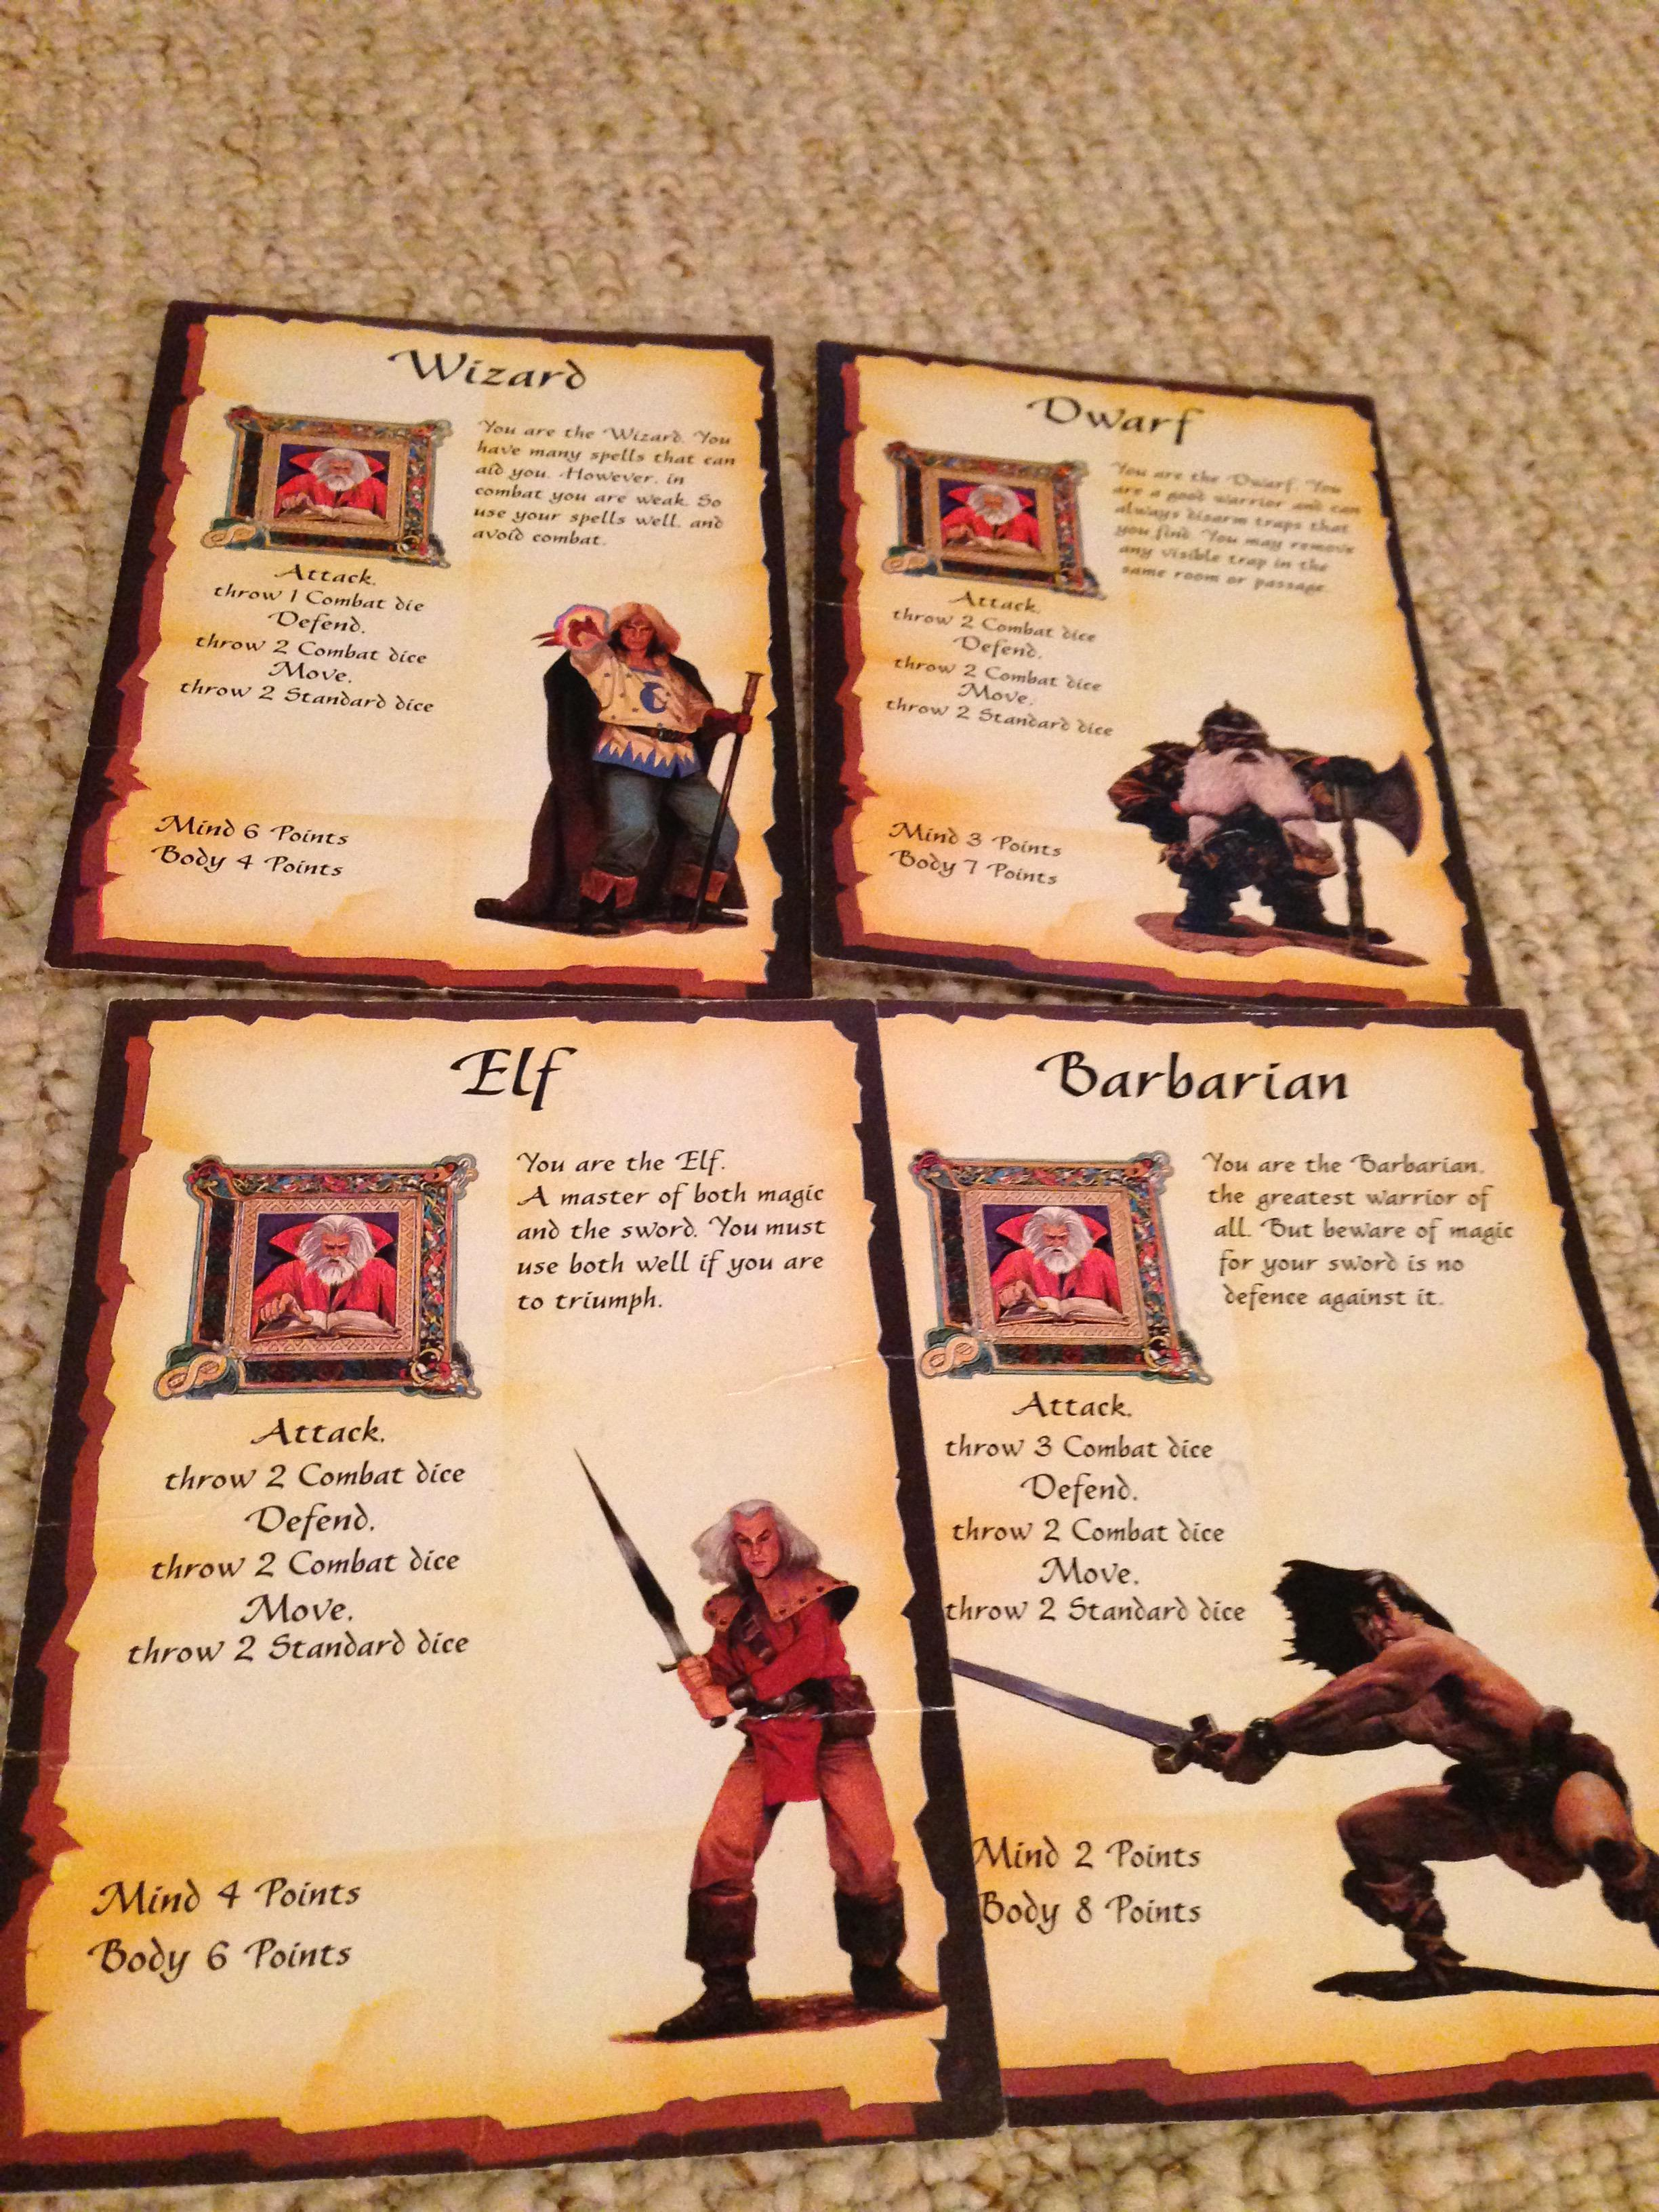 Barbarian, Dwarves, Elves, Game, Games Workshop, Gargoyle, Heroquest, Kellar, Keller, Ogres, Quest, Tabletop, Warhammer Fantasy, Witch Lord, Wizard